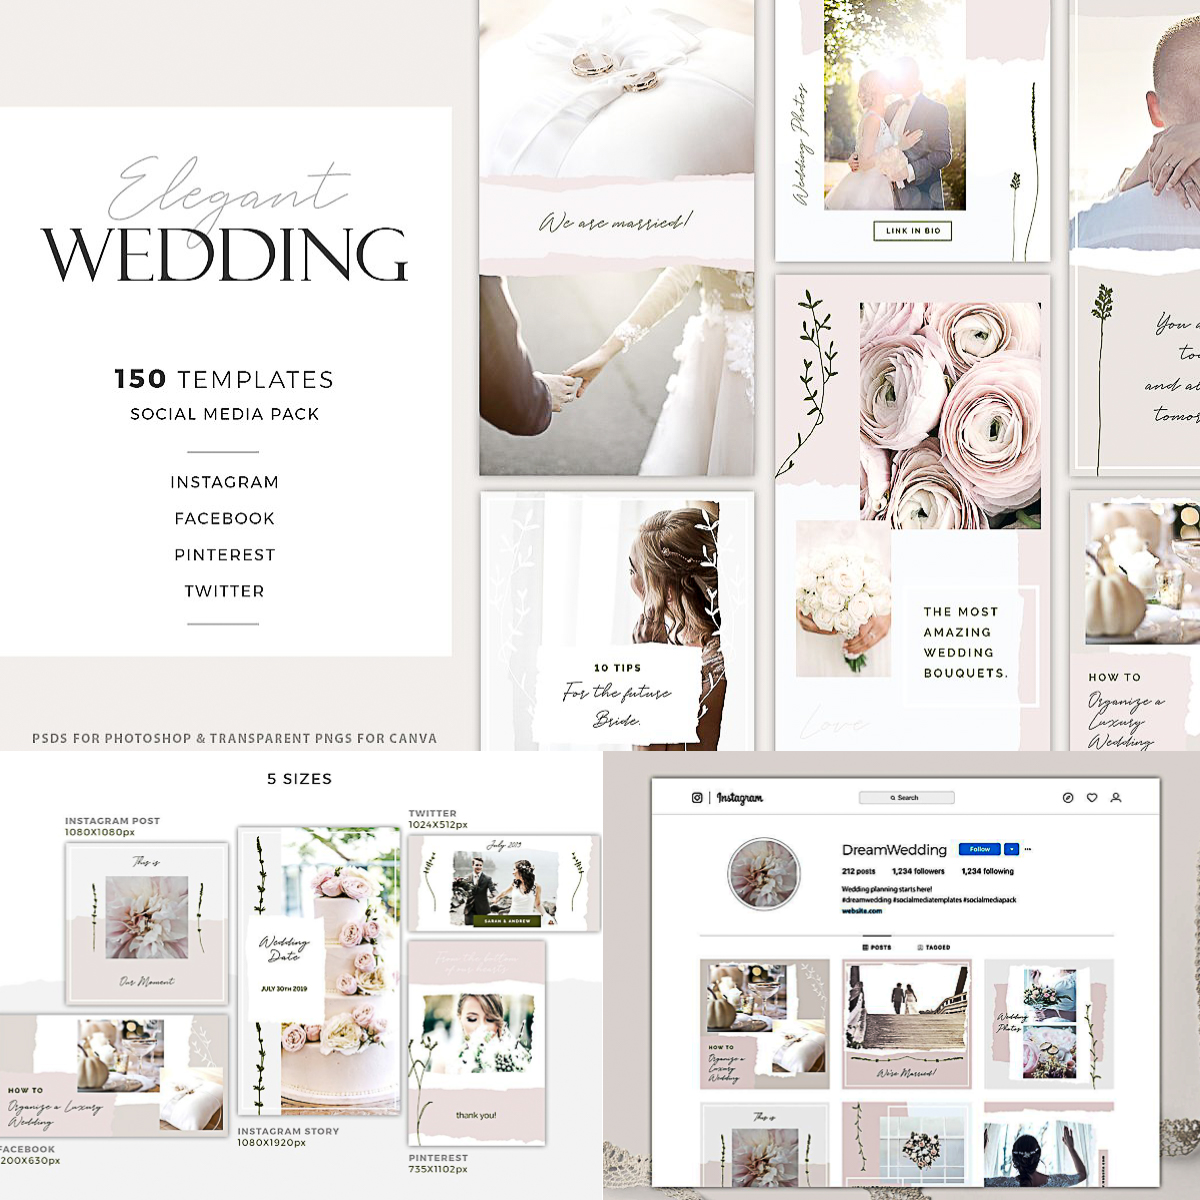 Elegant Wedding Social Media Pack   Free download